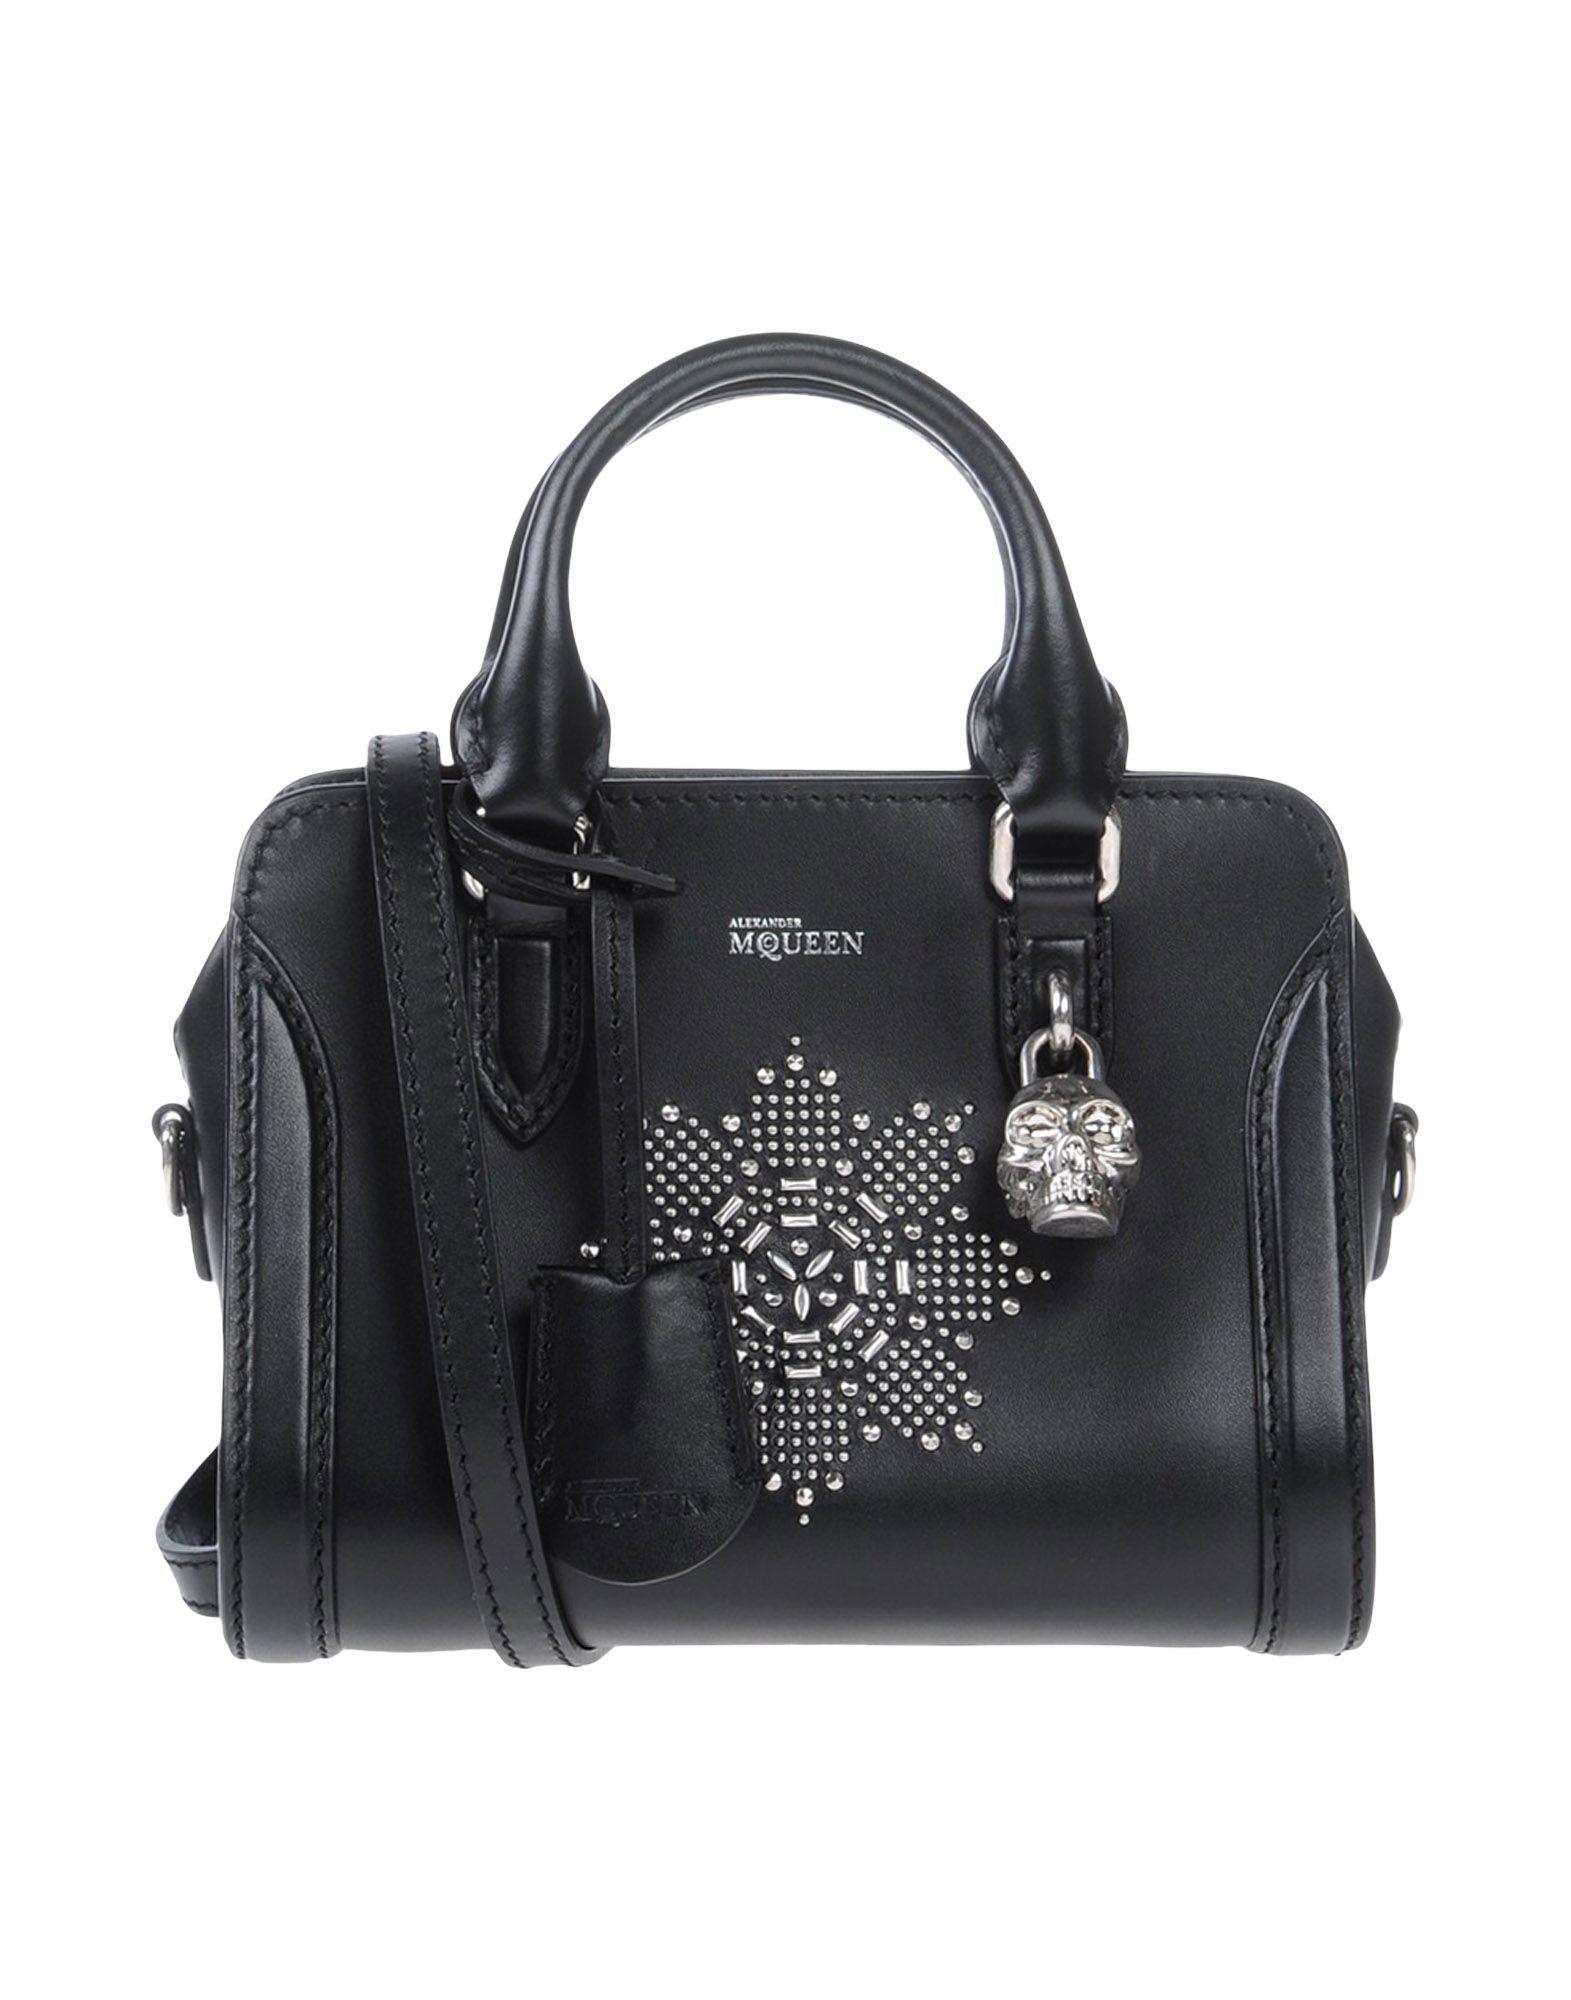 Alexander mcqueen Handbag in Black | Lyst